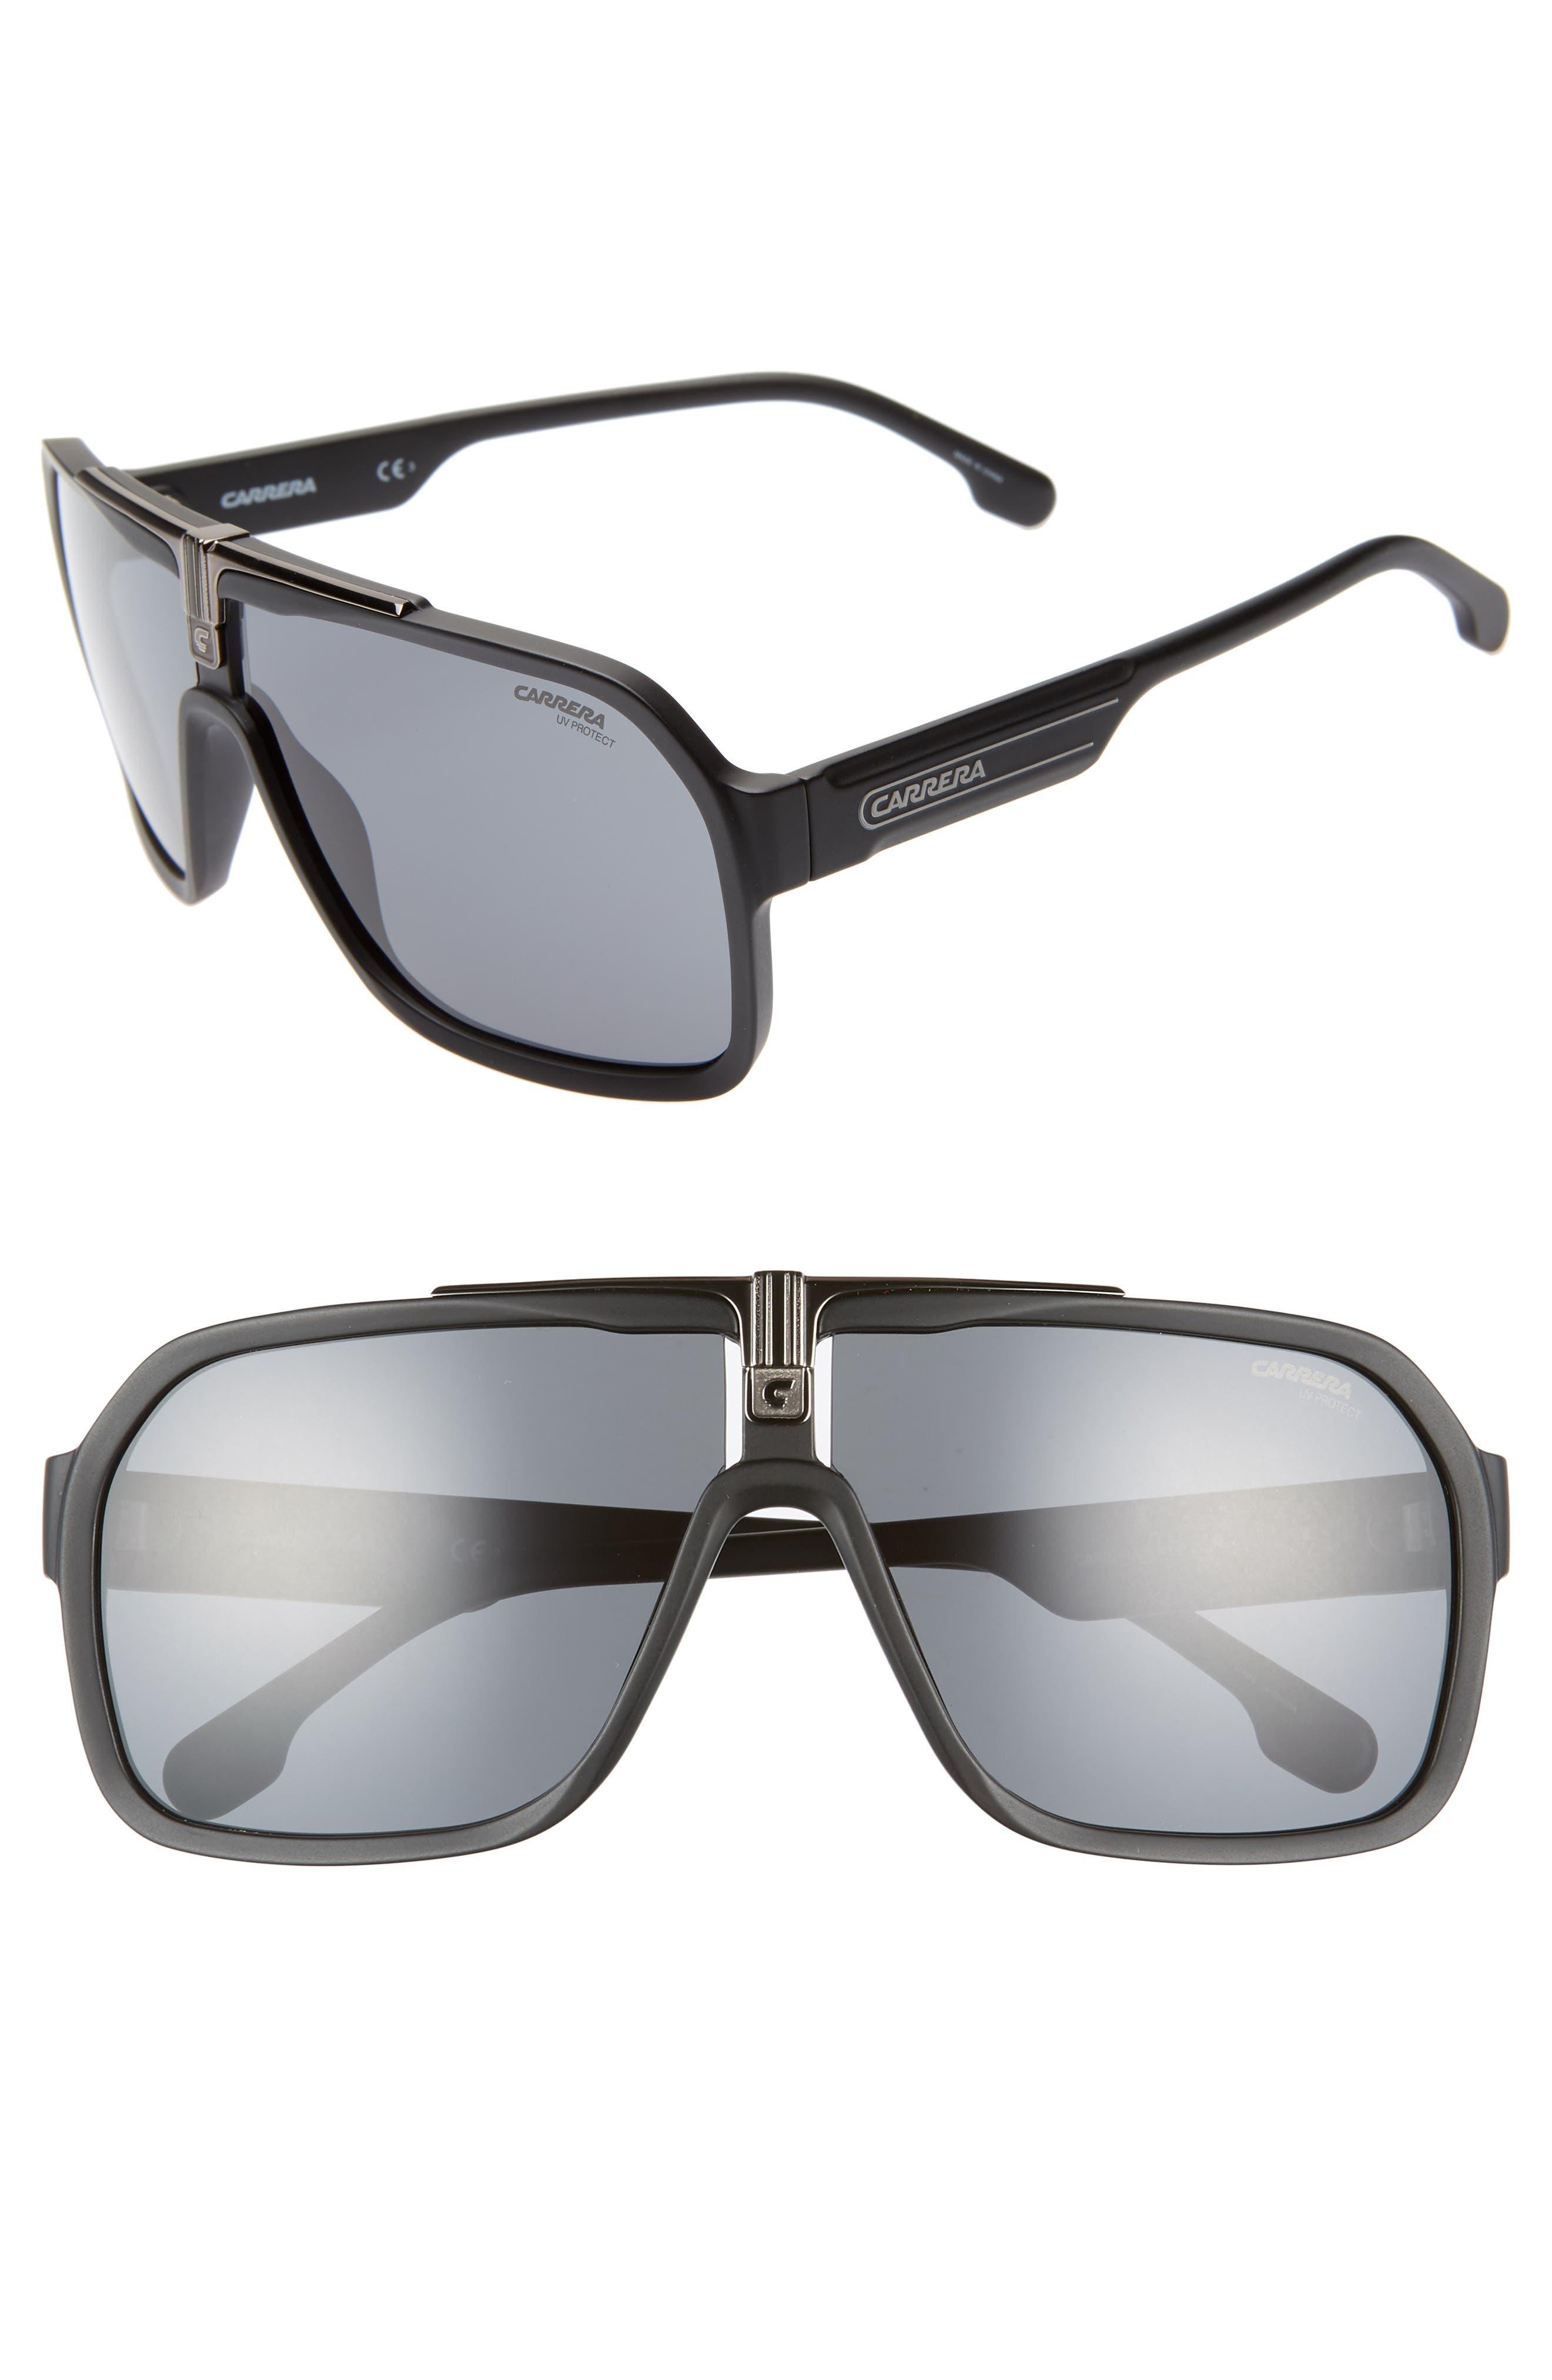 64mm Navigator Sunglasses,                             Main thumbnail 1, color,                             MATTE BLACK